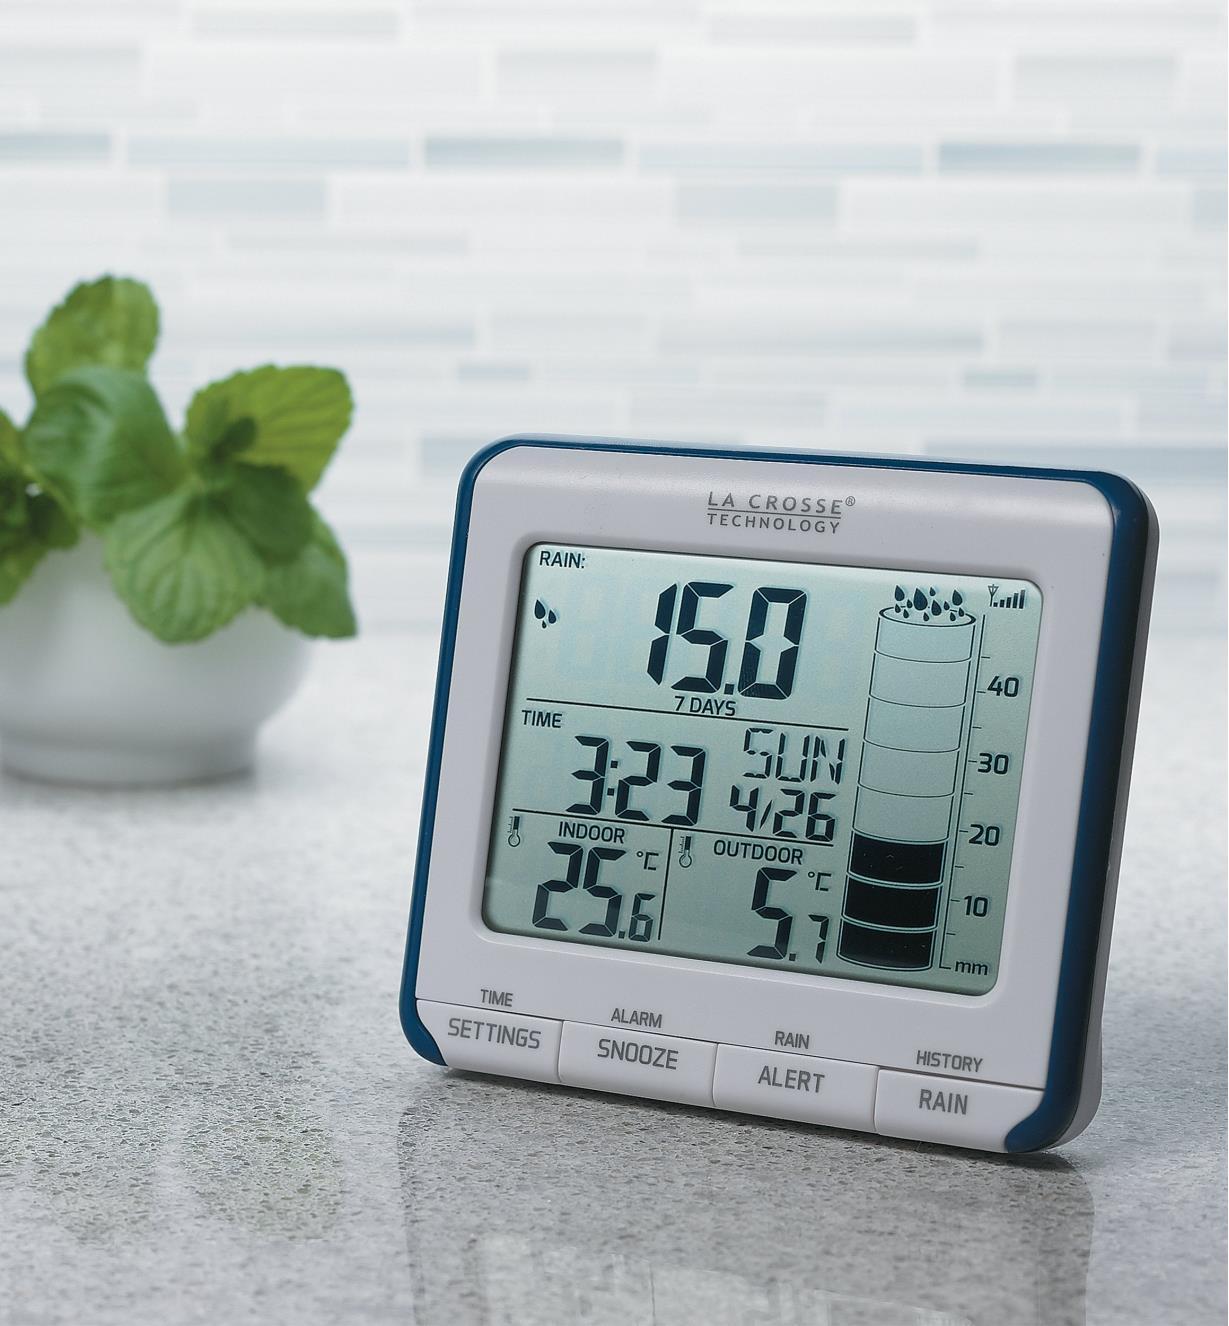 Wireless Rain Gauge display sitting on a counter